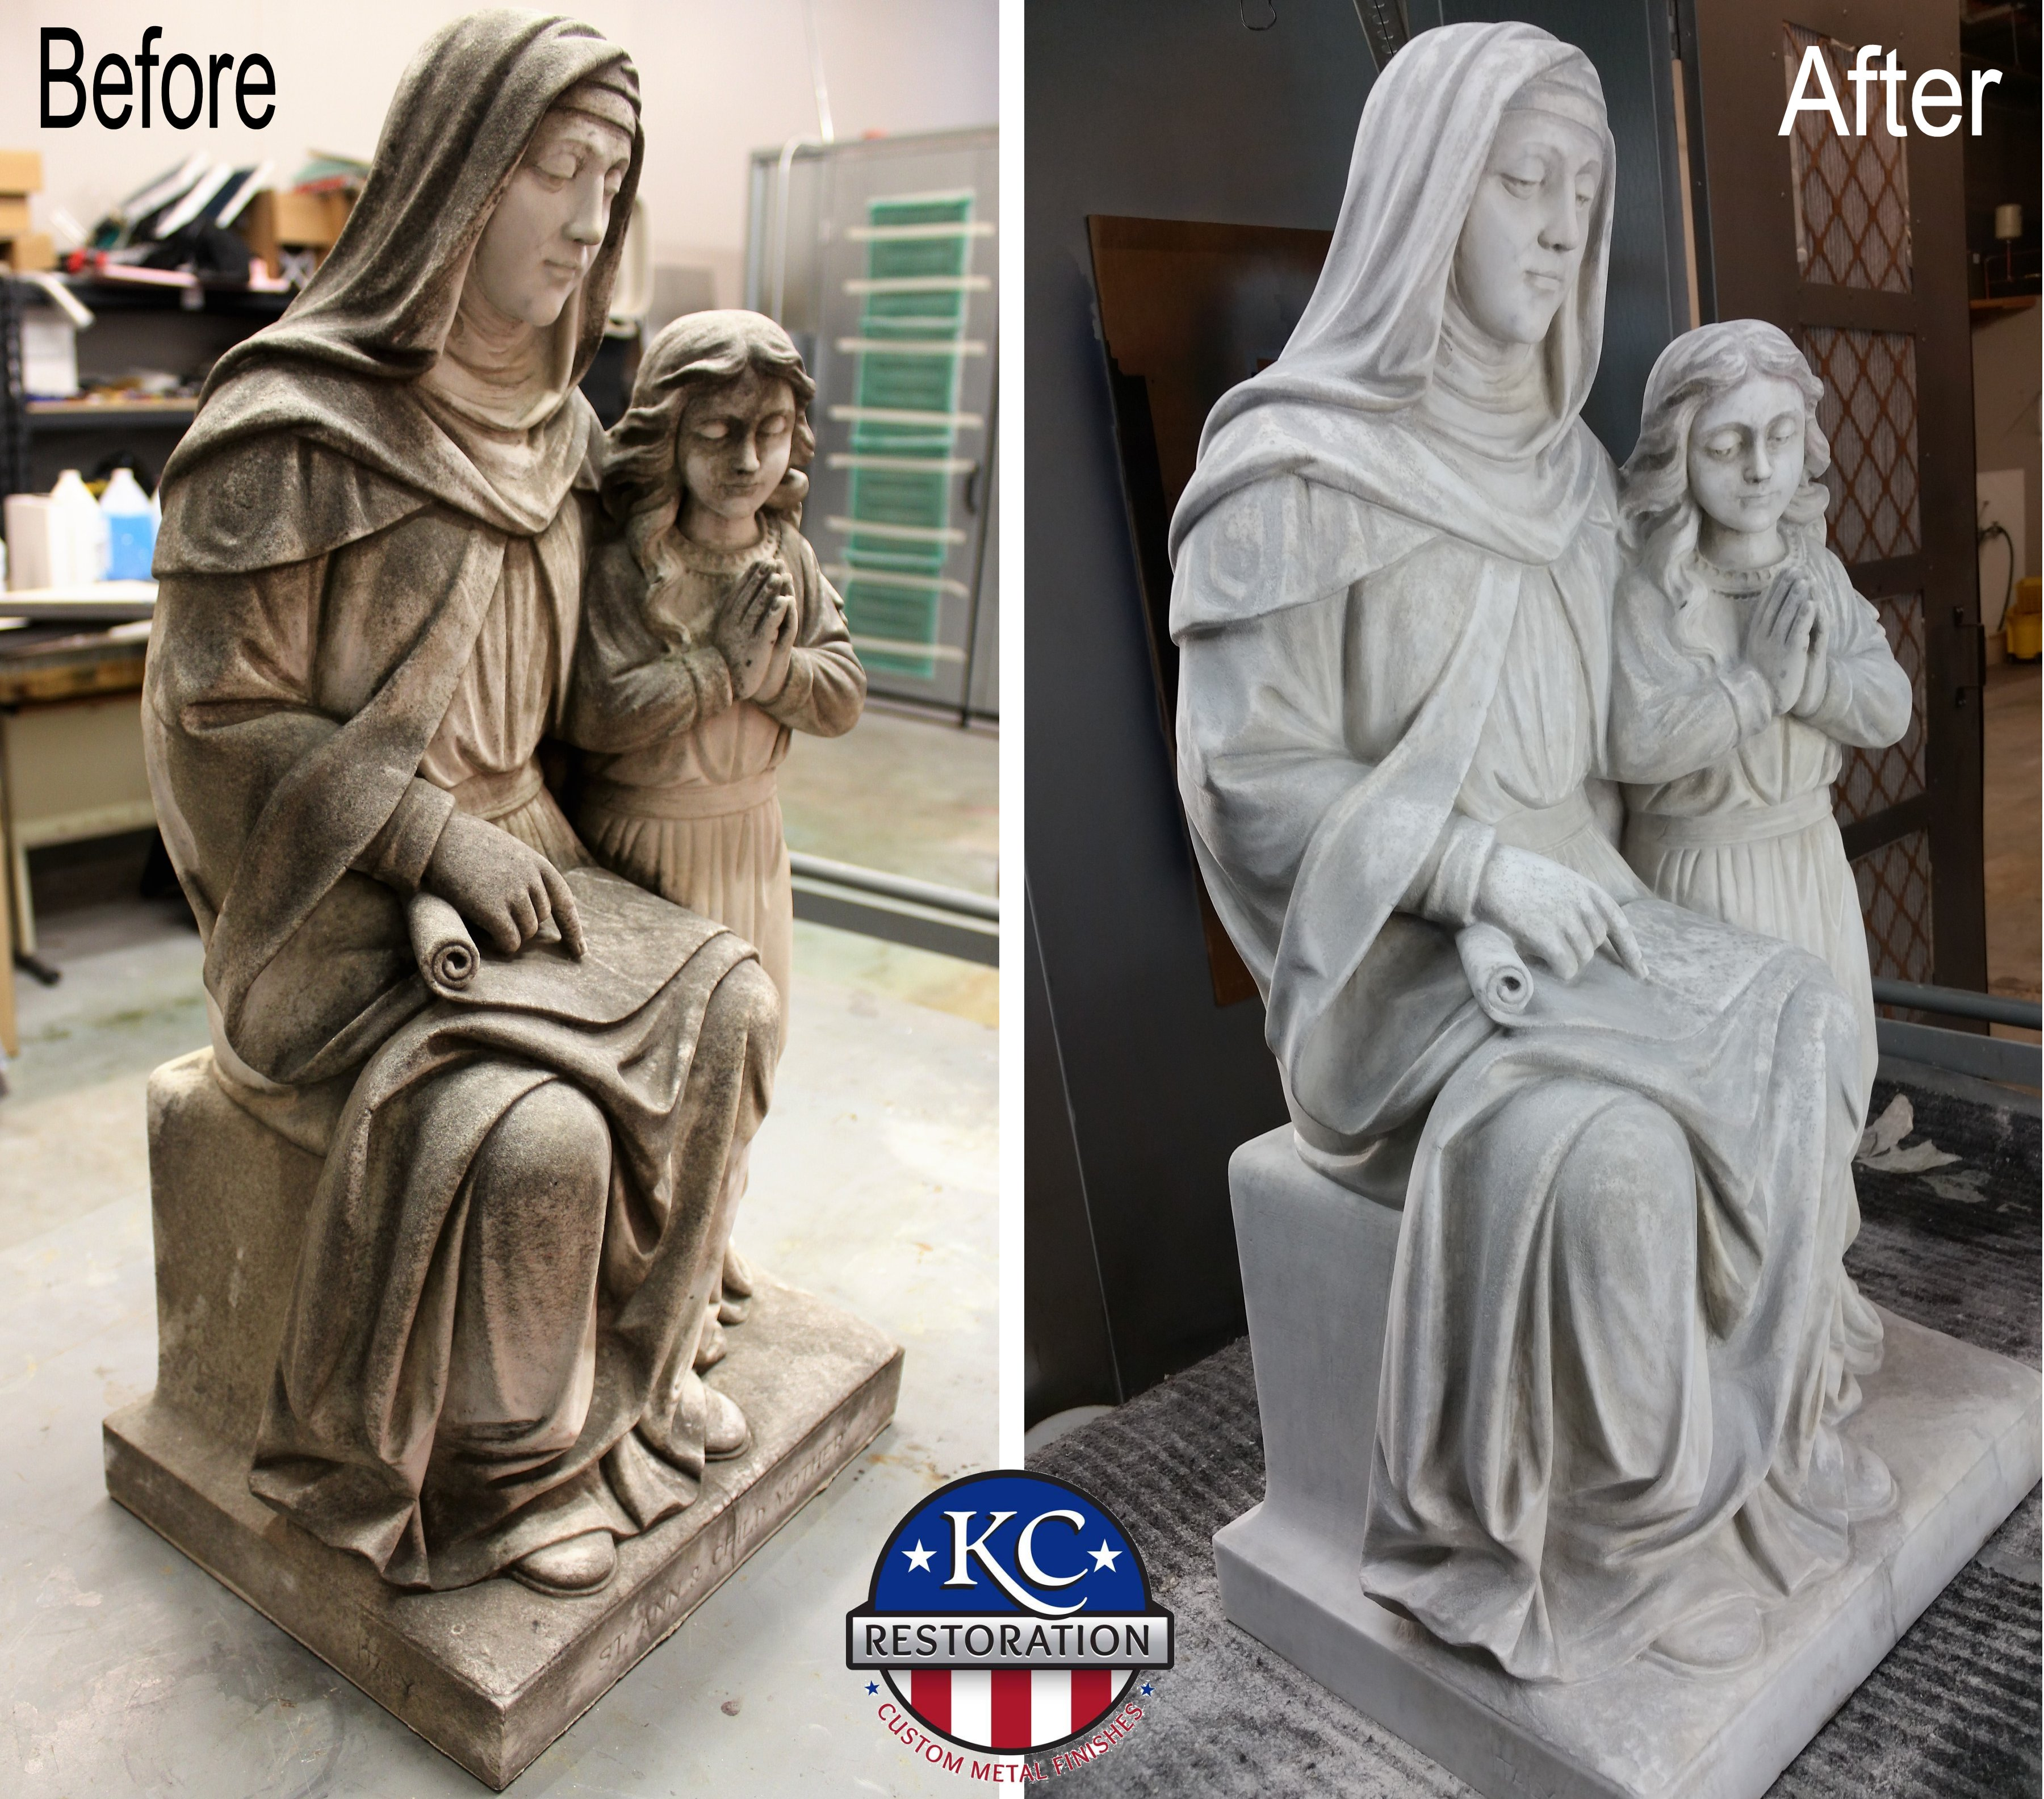 Marble statue restoration